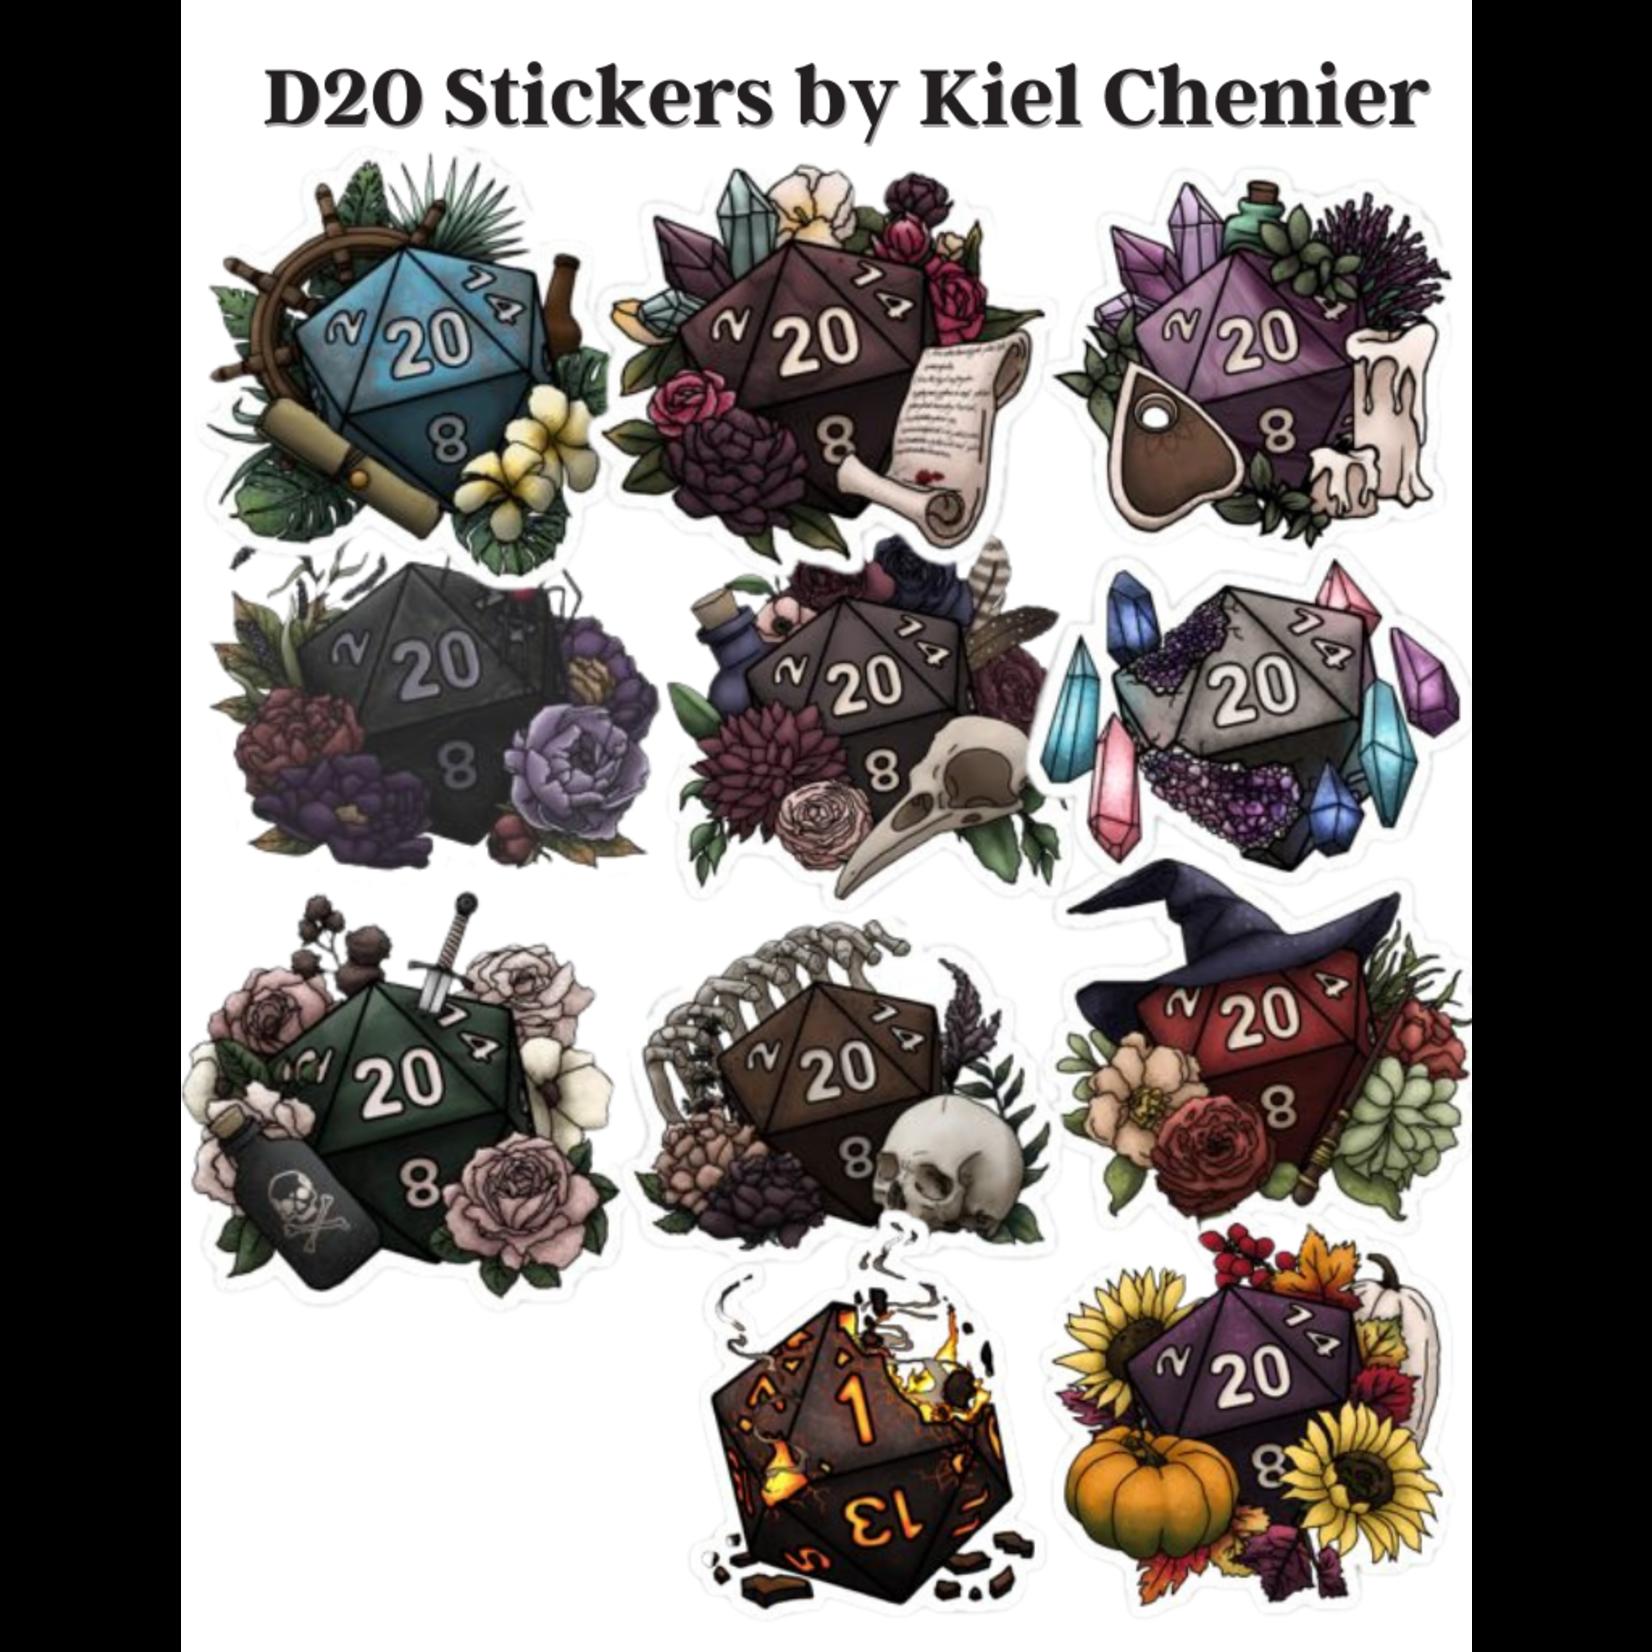 D20 Stickers by Kiel Chenier